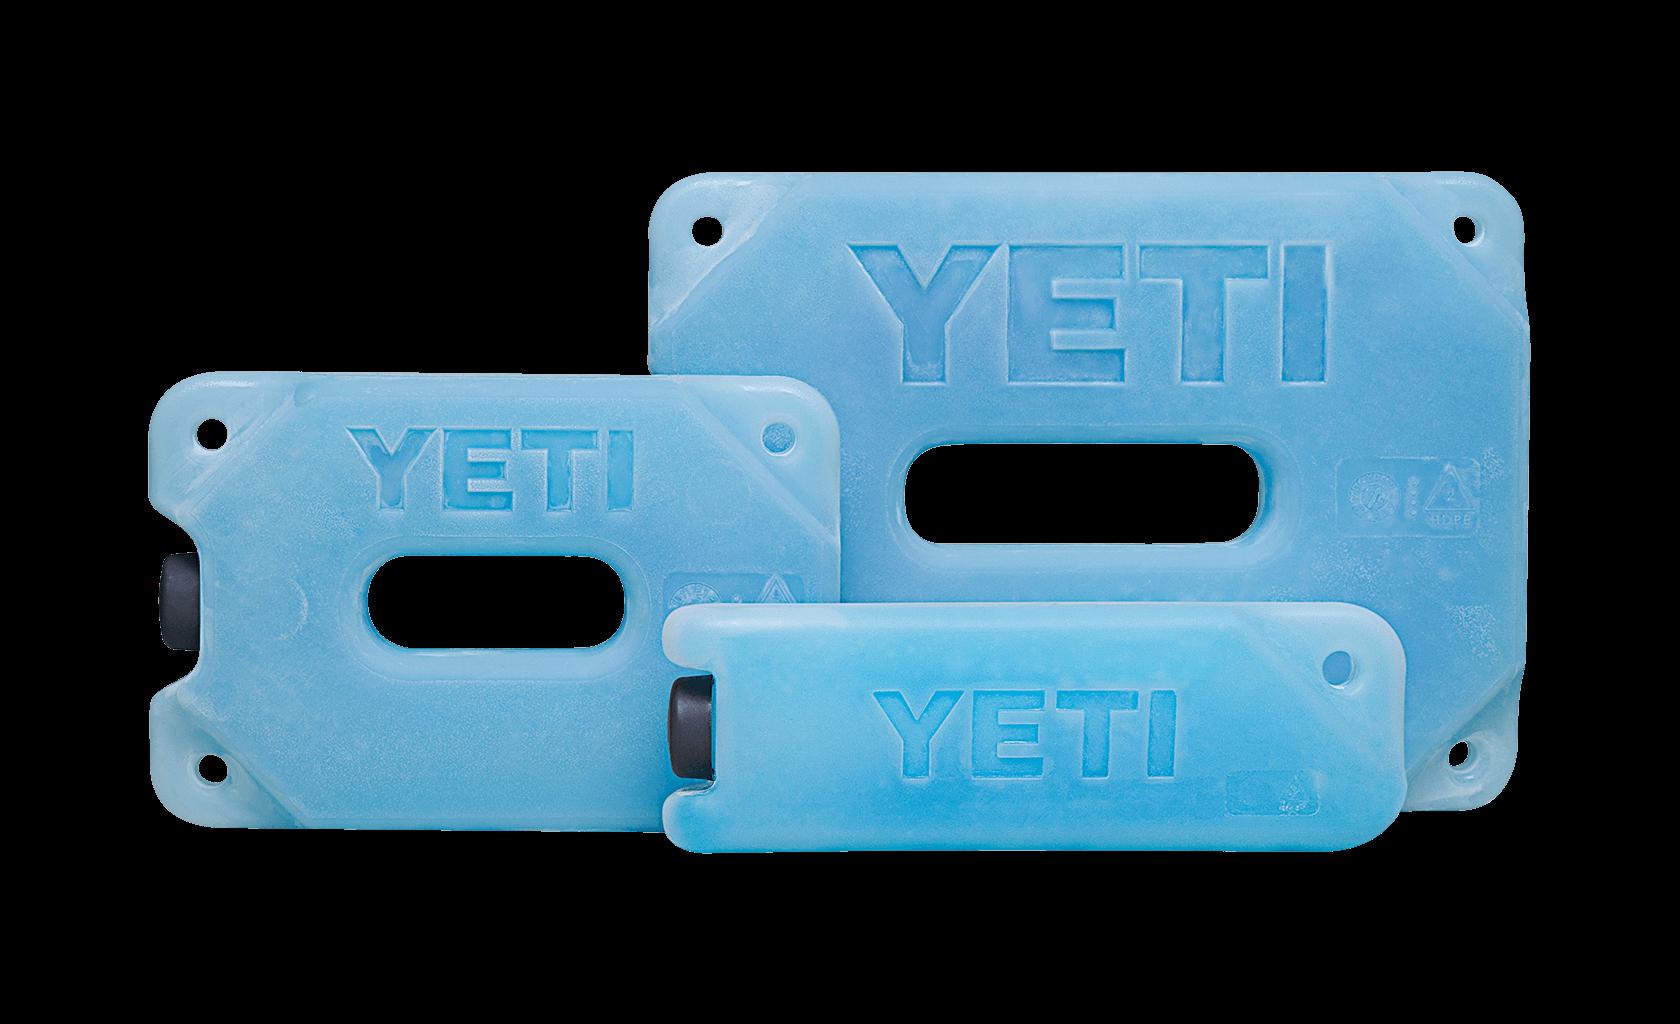 Yeti Ice:  https://ironbowflyshop.ca/products/yeti-ice